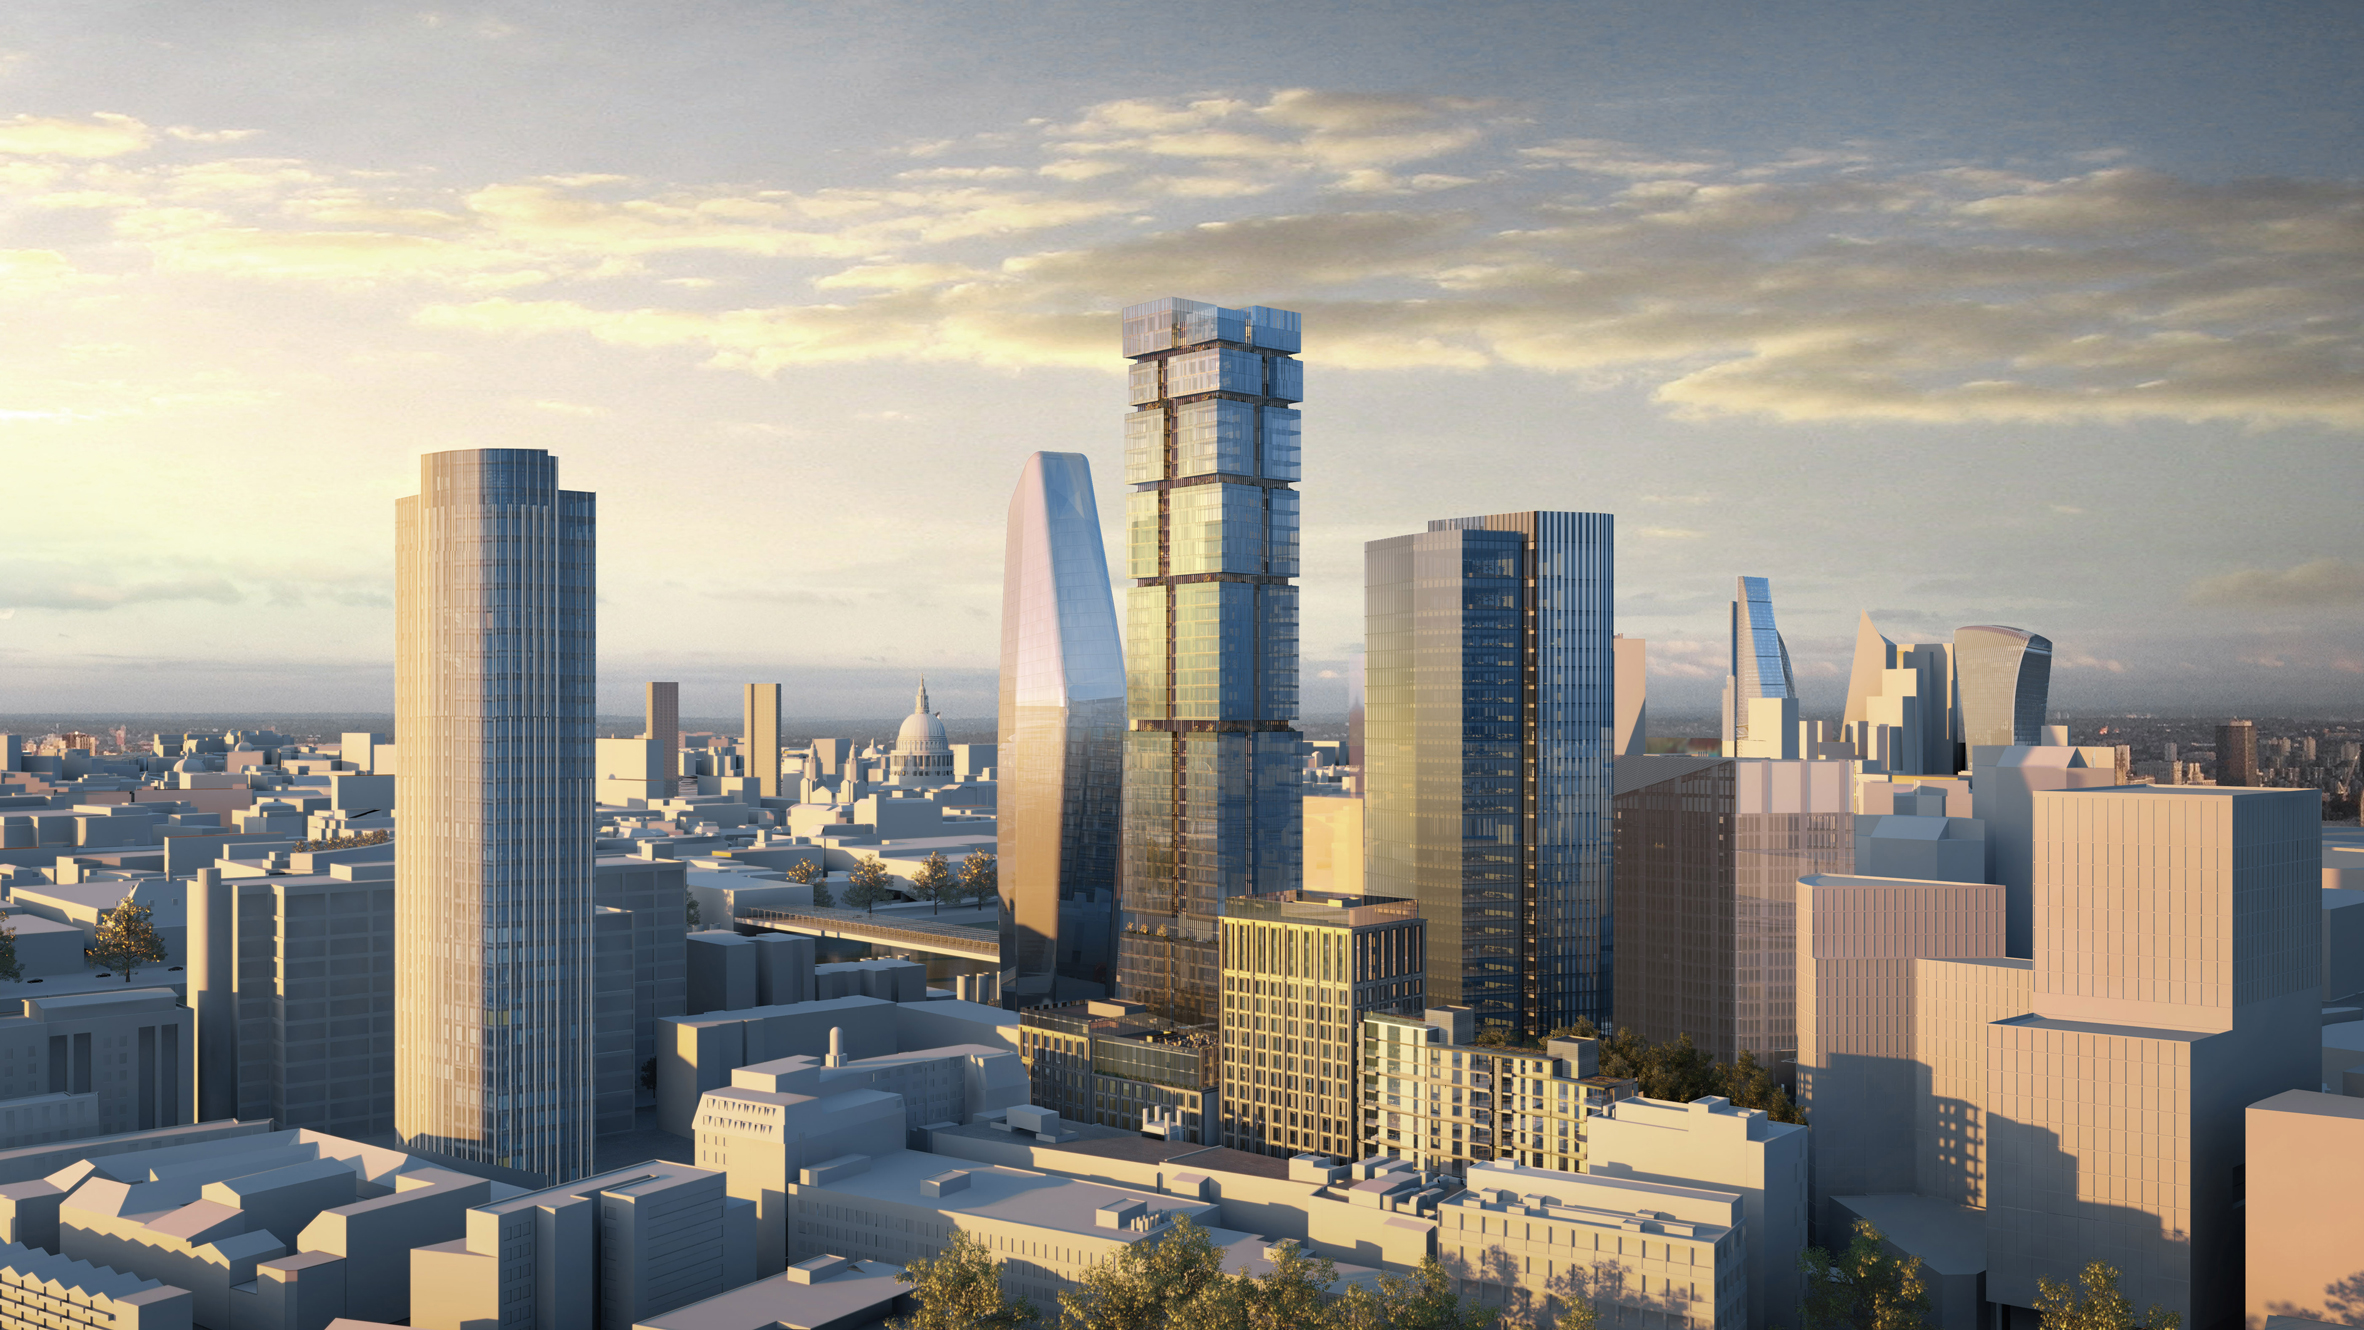 blackfriars-tower-london-skyscrapers-uk-architecture-news_dezeen_hero